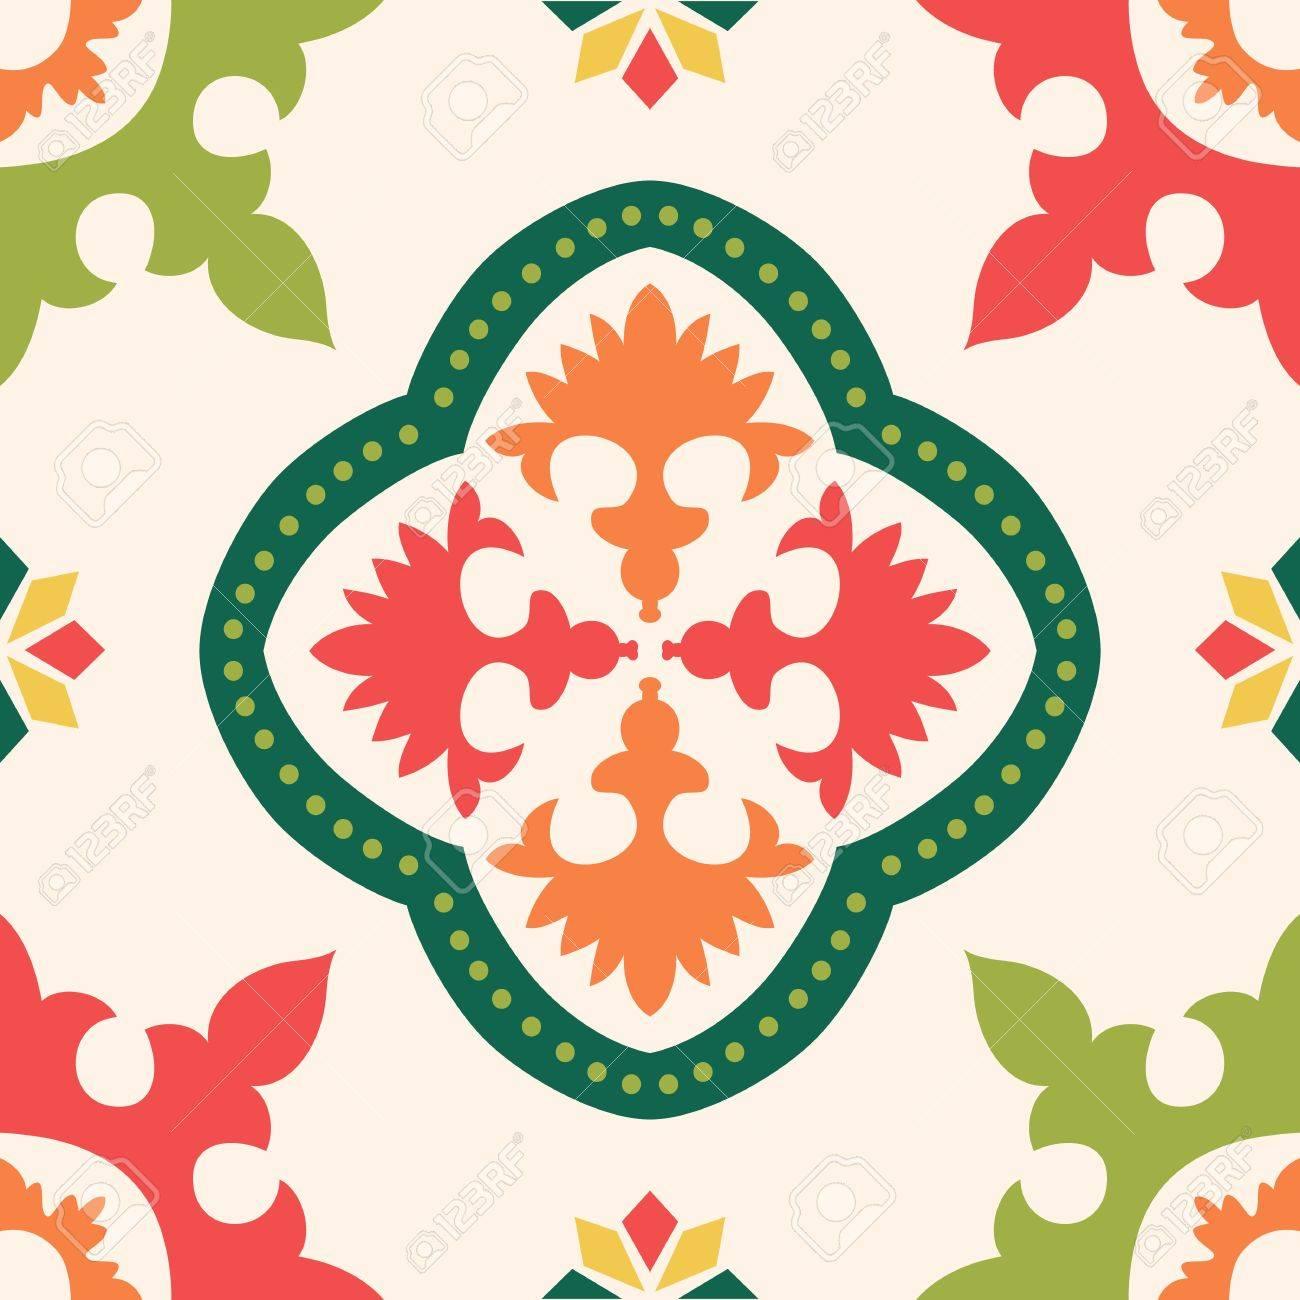 Beautiful seamless ornamental tile background illustration - 19052426